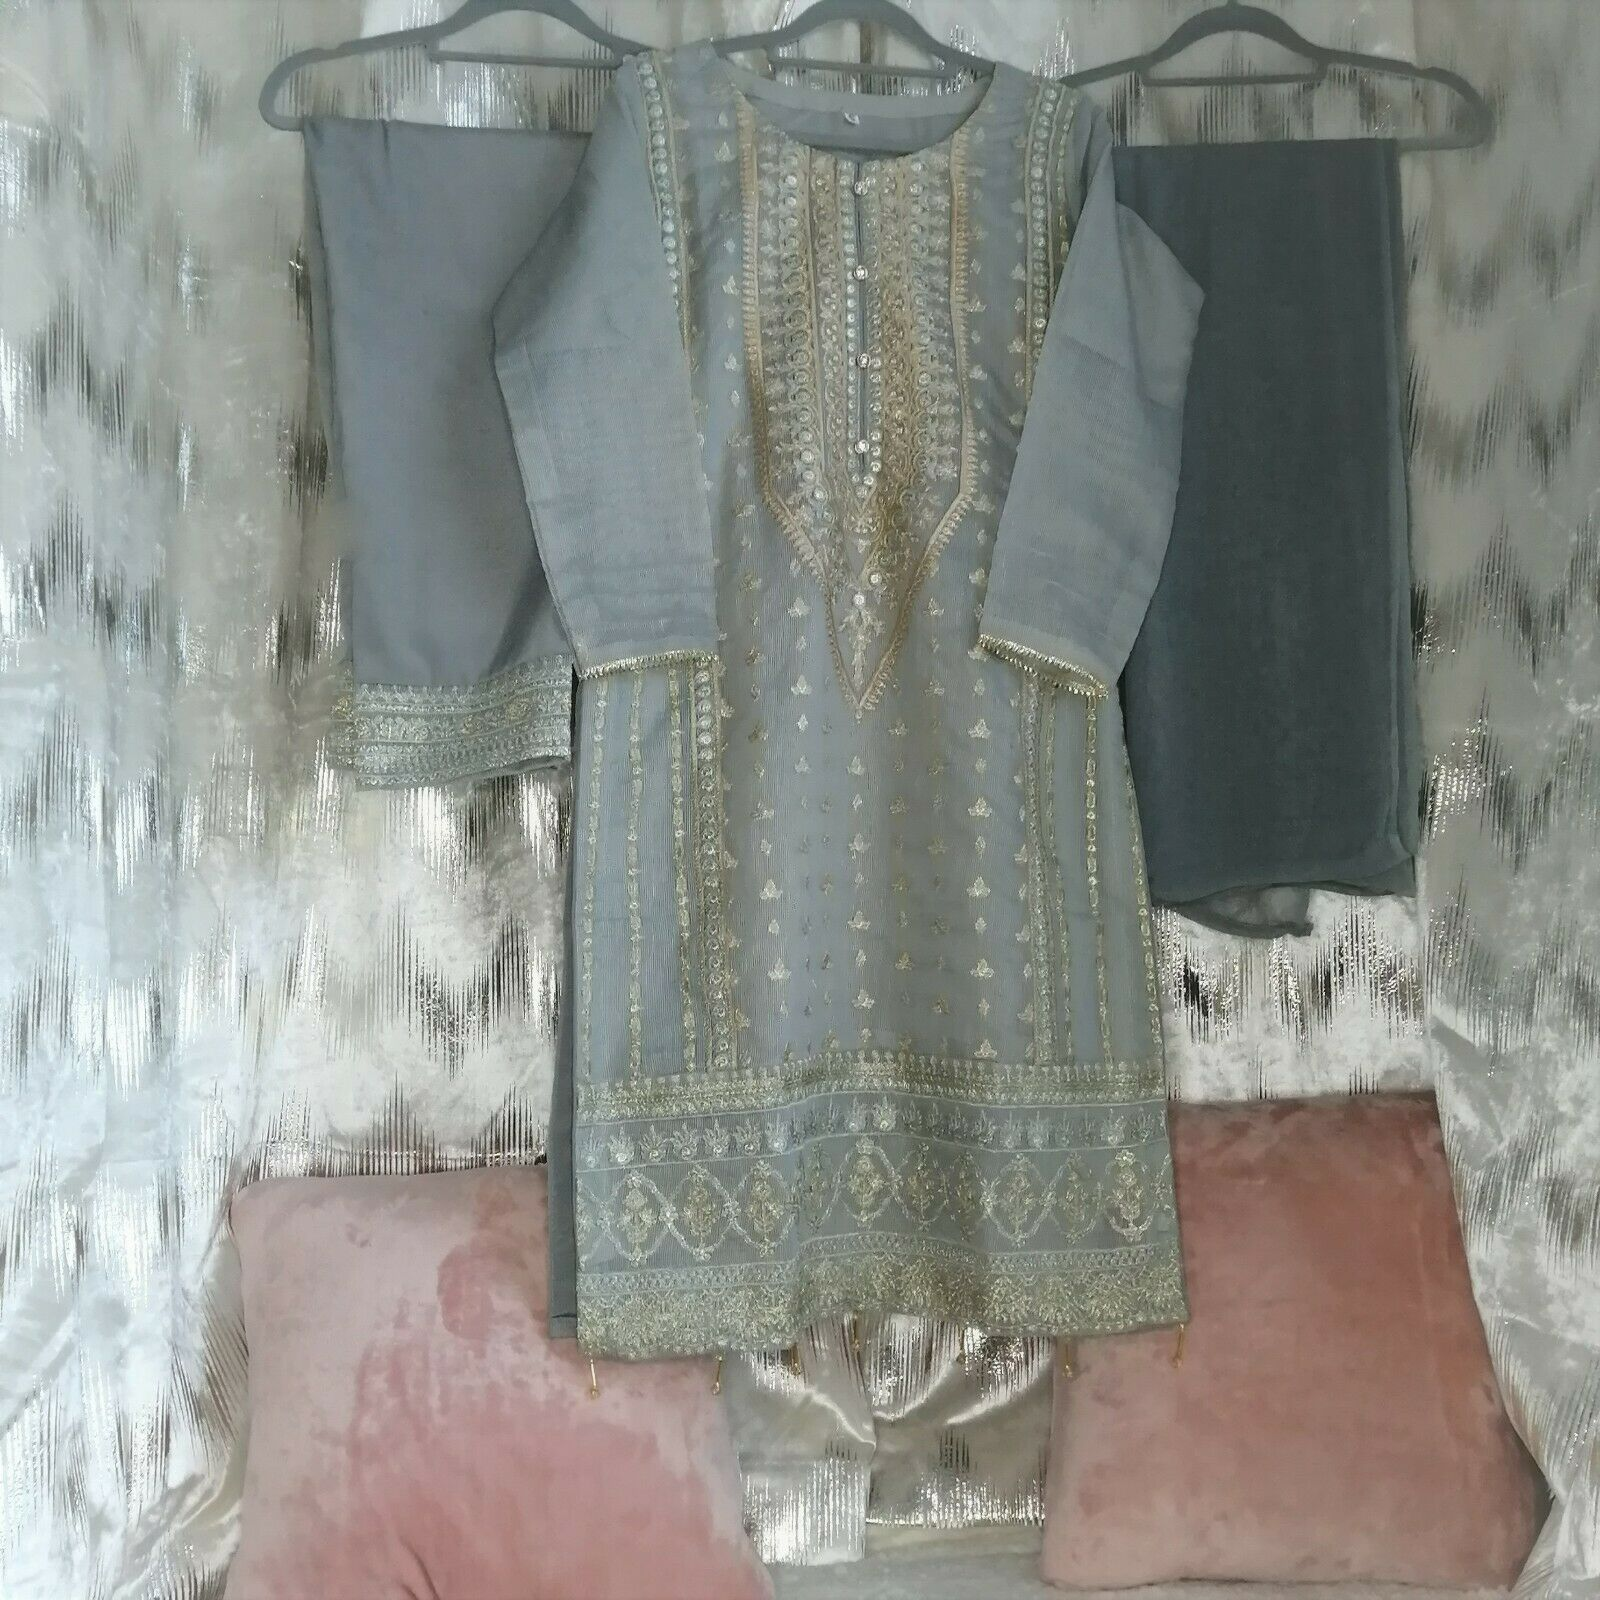 Readymade Shalwar Kameez Organza Grey Large Fancywear COMES WITH PLAIN SHALWAR